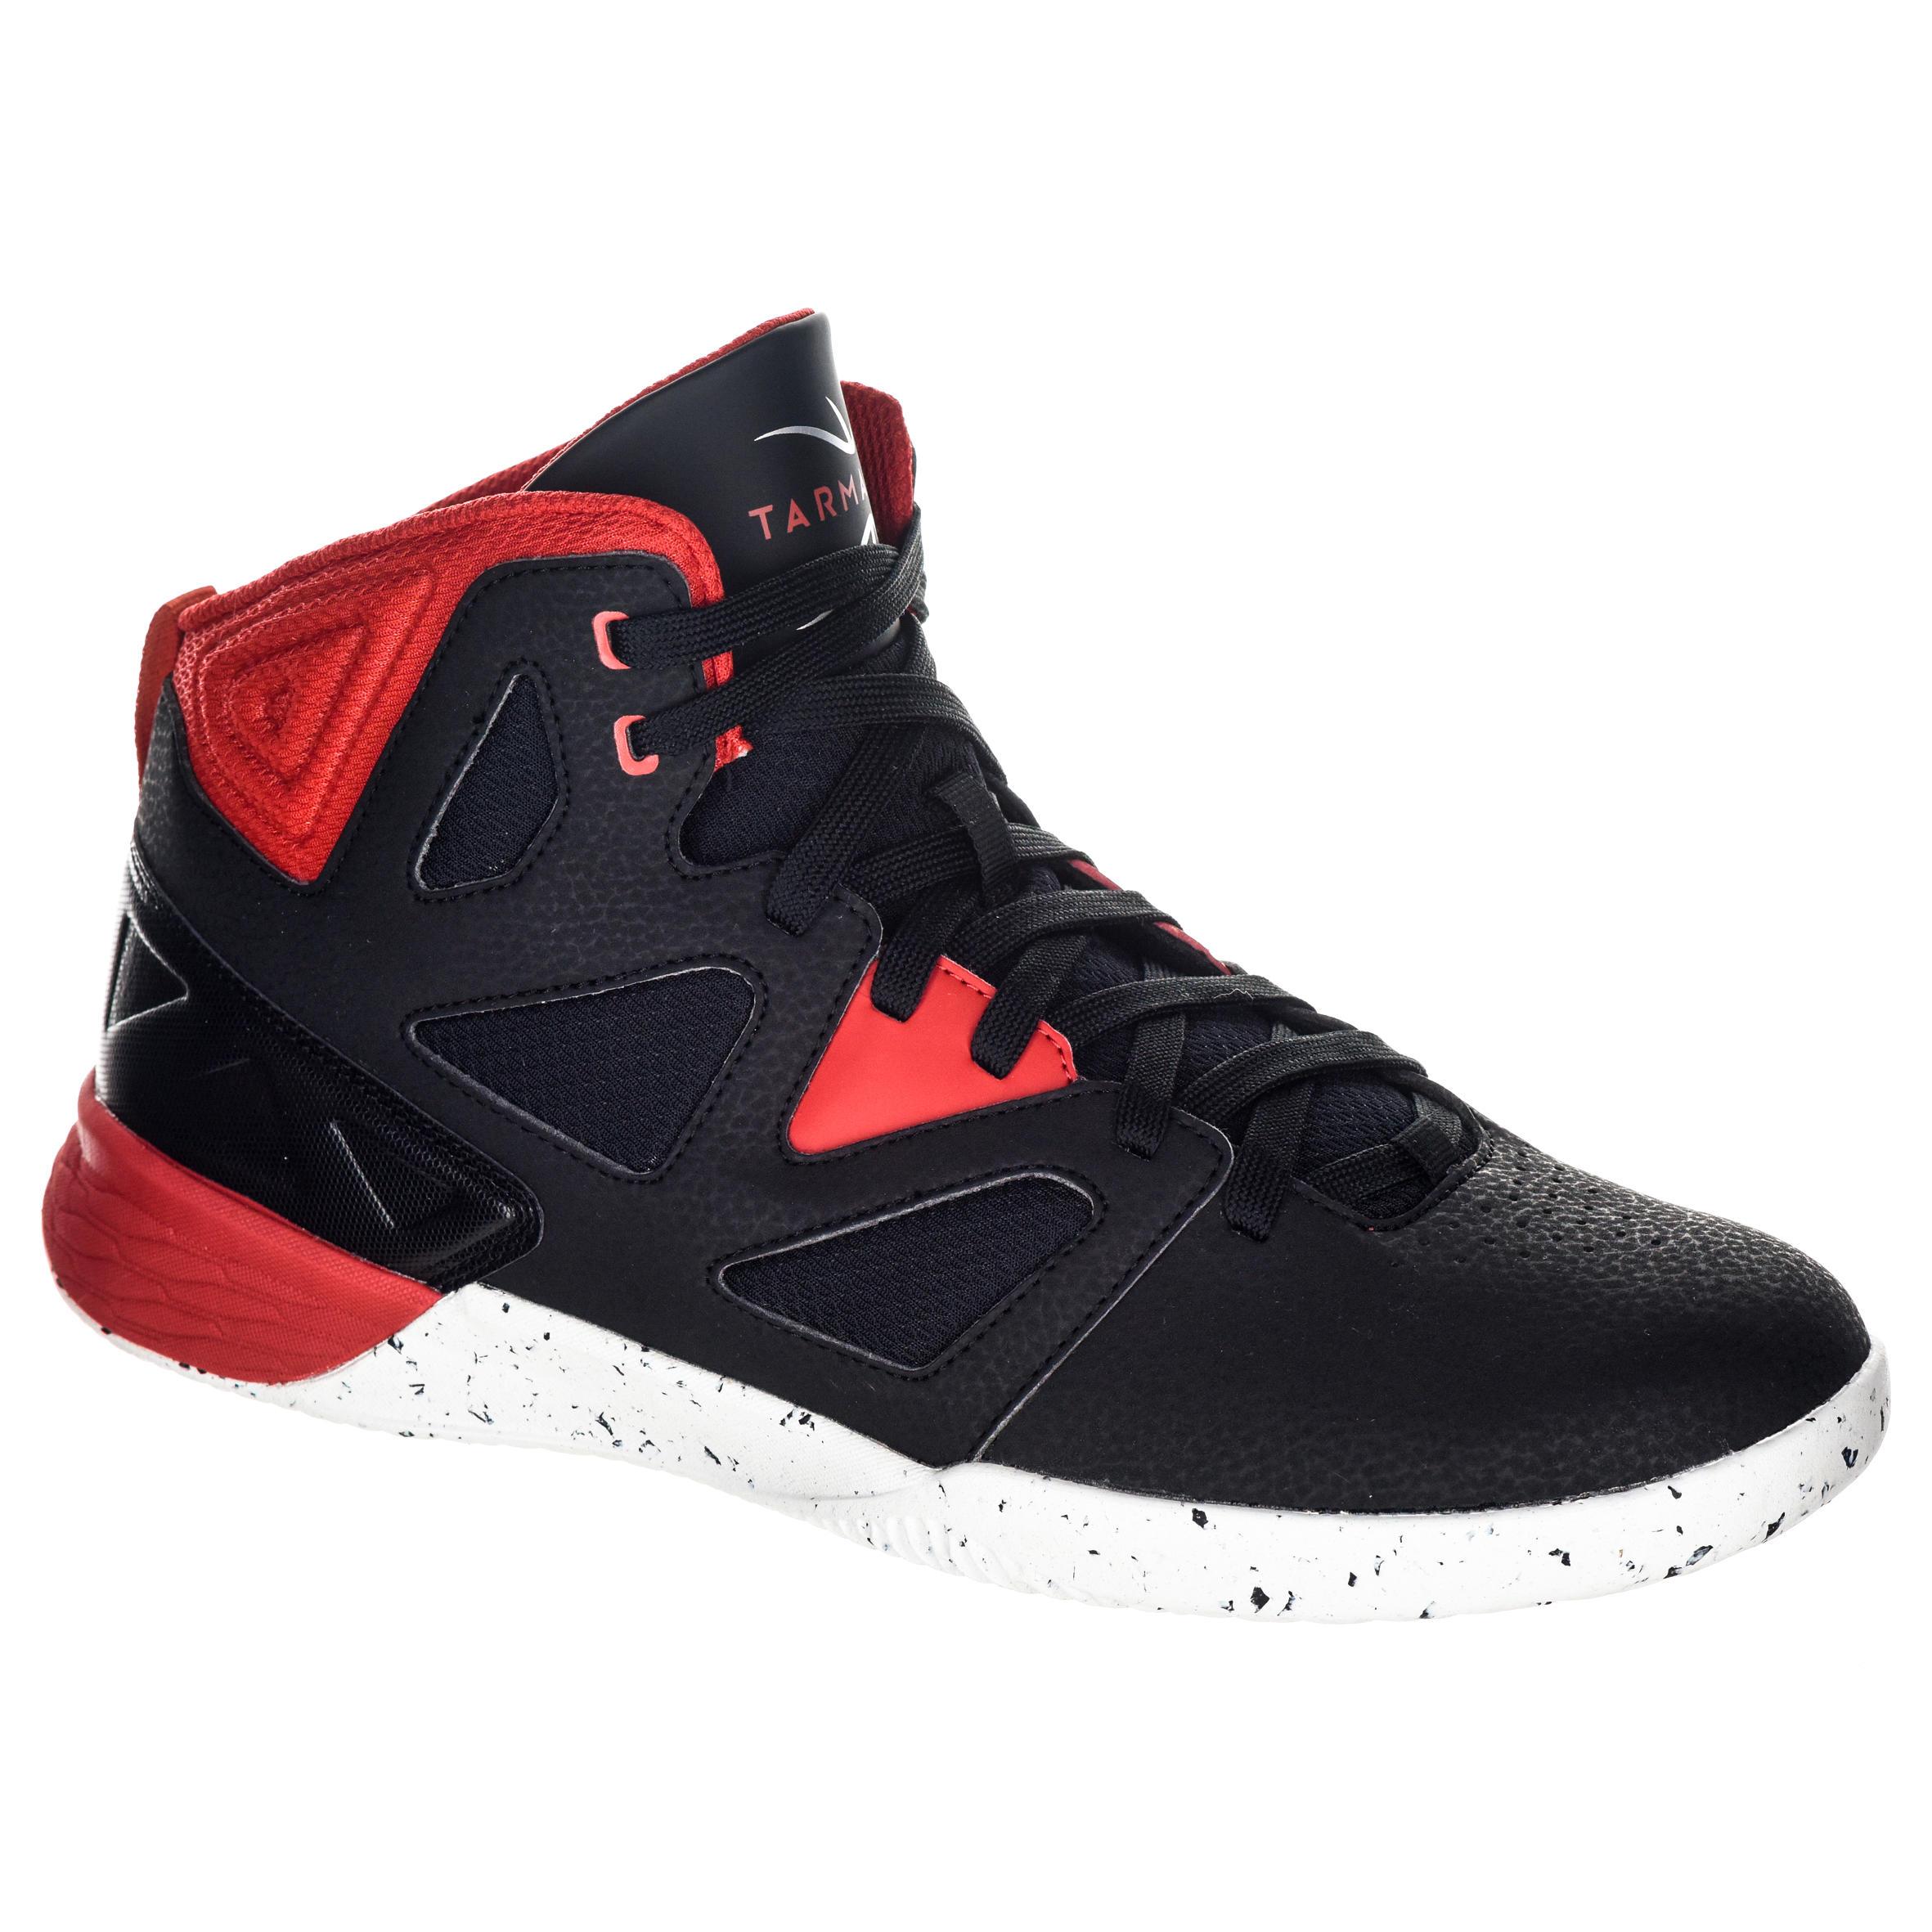 Tarmak Basketbalschoenen volwassenen H/D beginners zwart/wit/rood